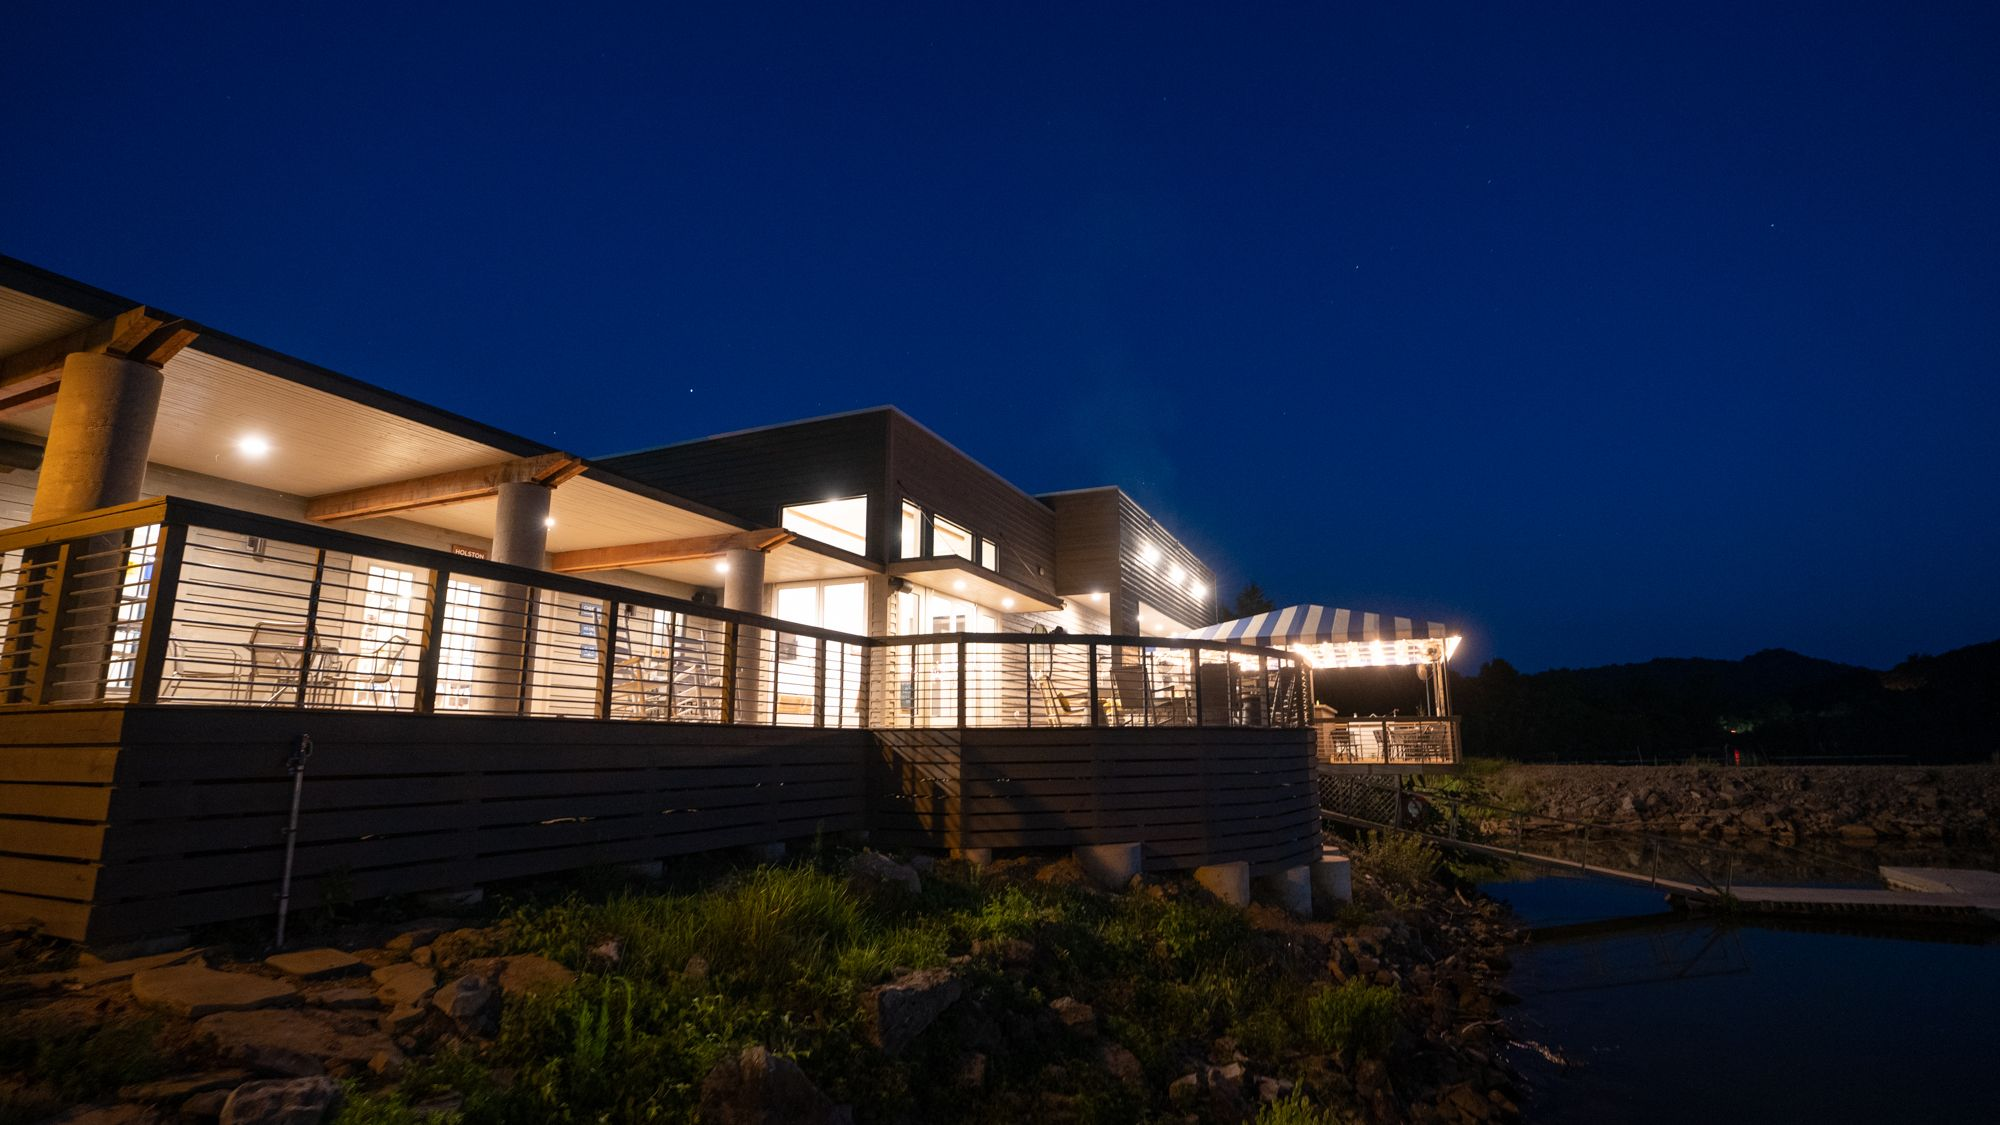 Wildwood Resort & Marina in Granville Tennessee